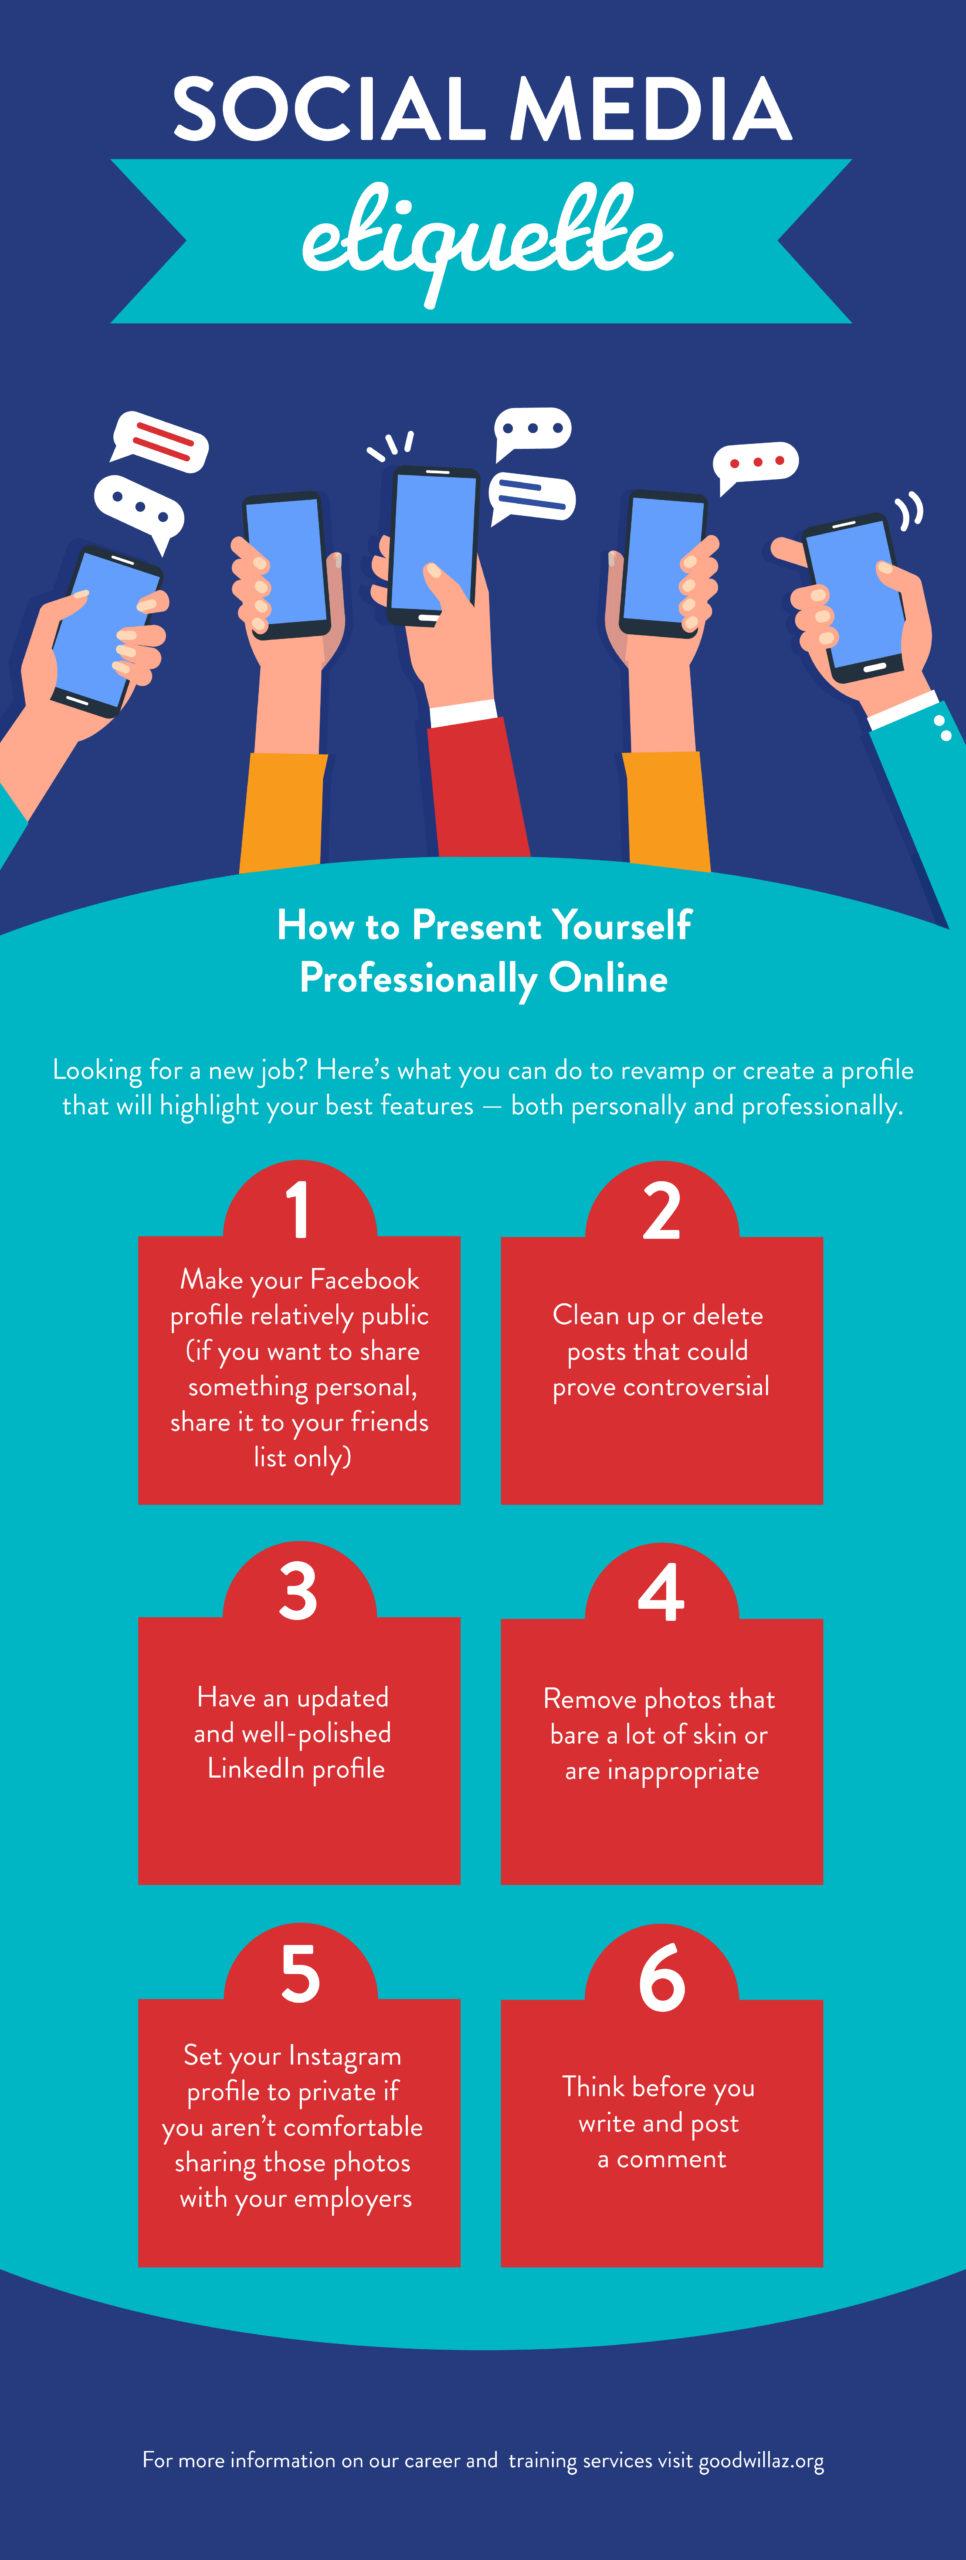 social media etiquette | Goodwill AZ